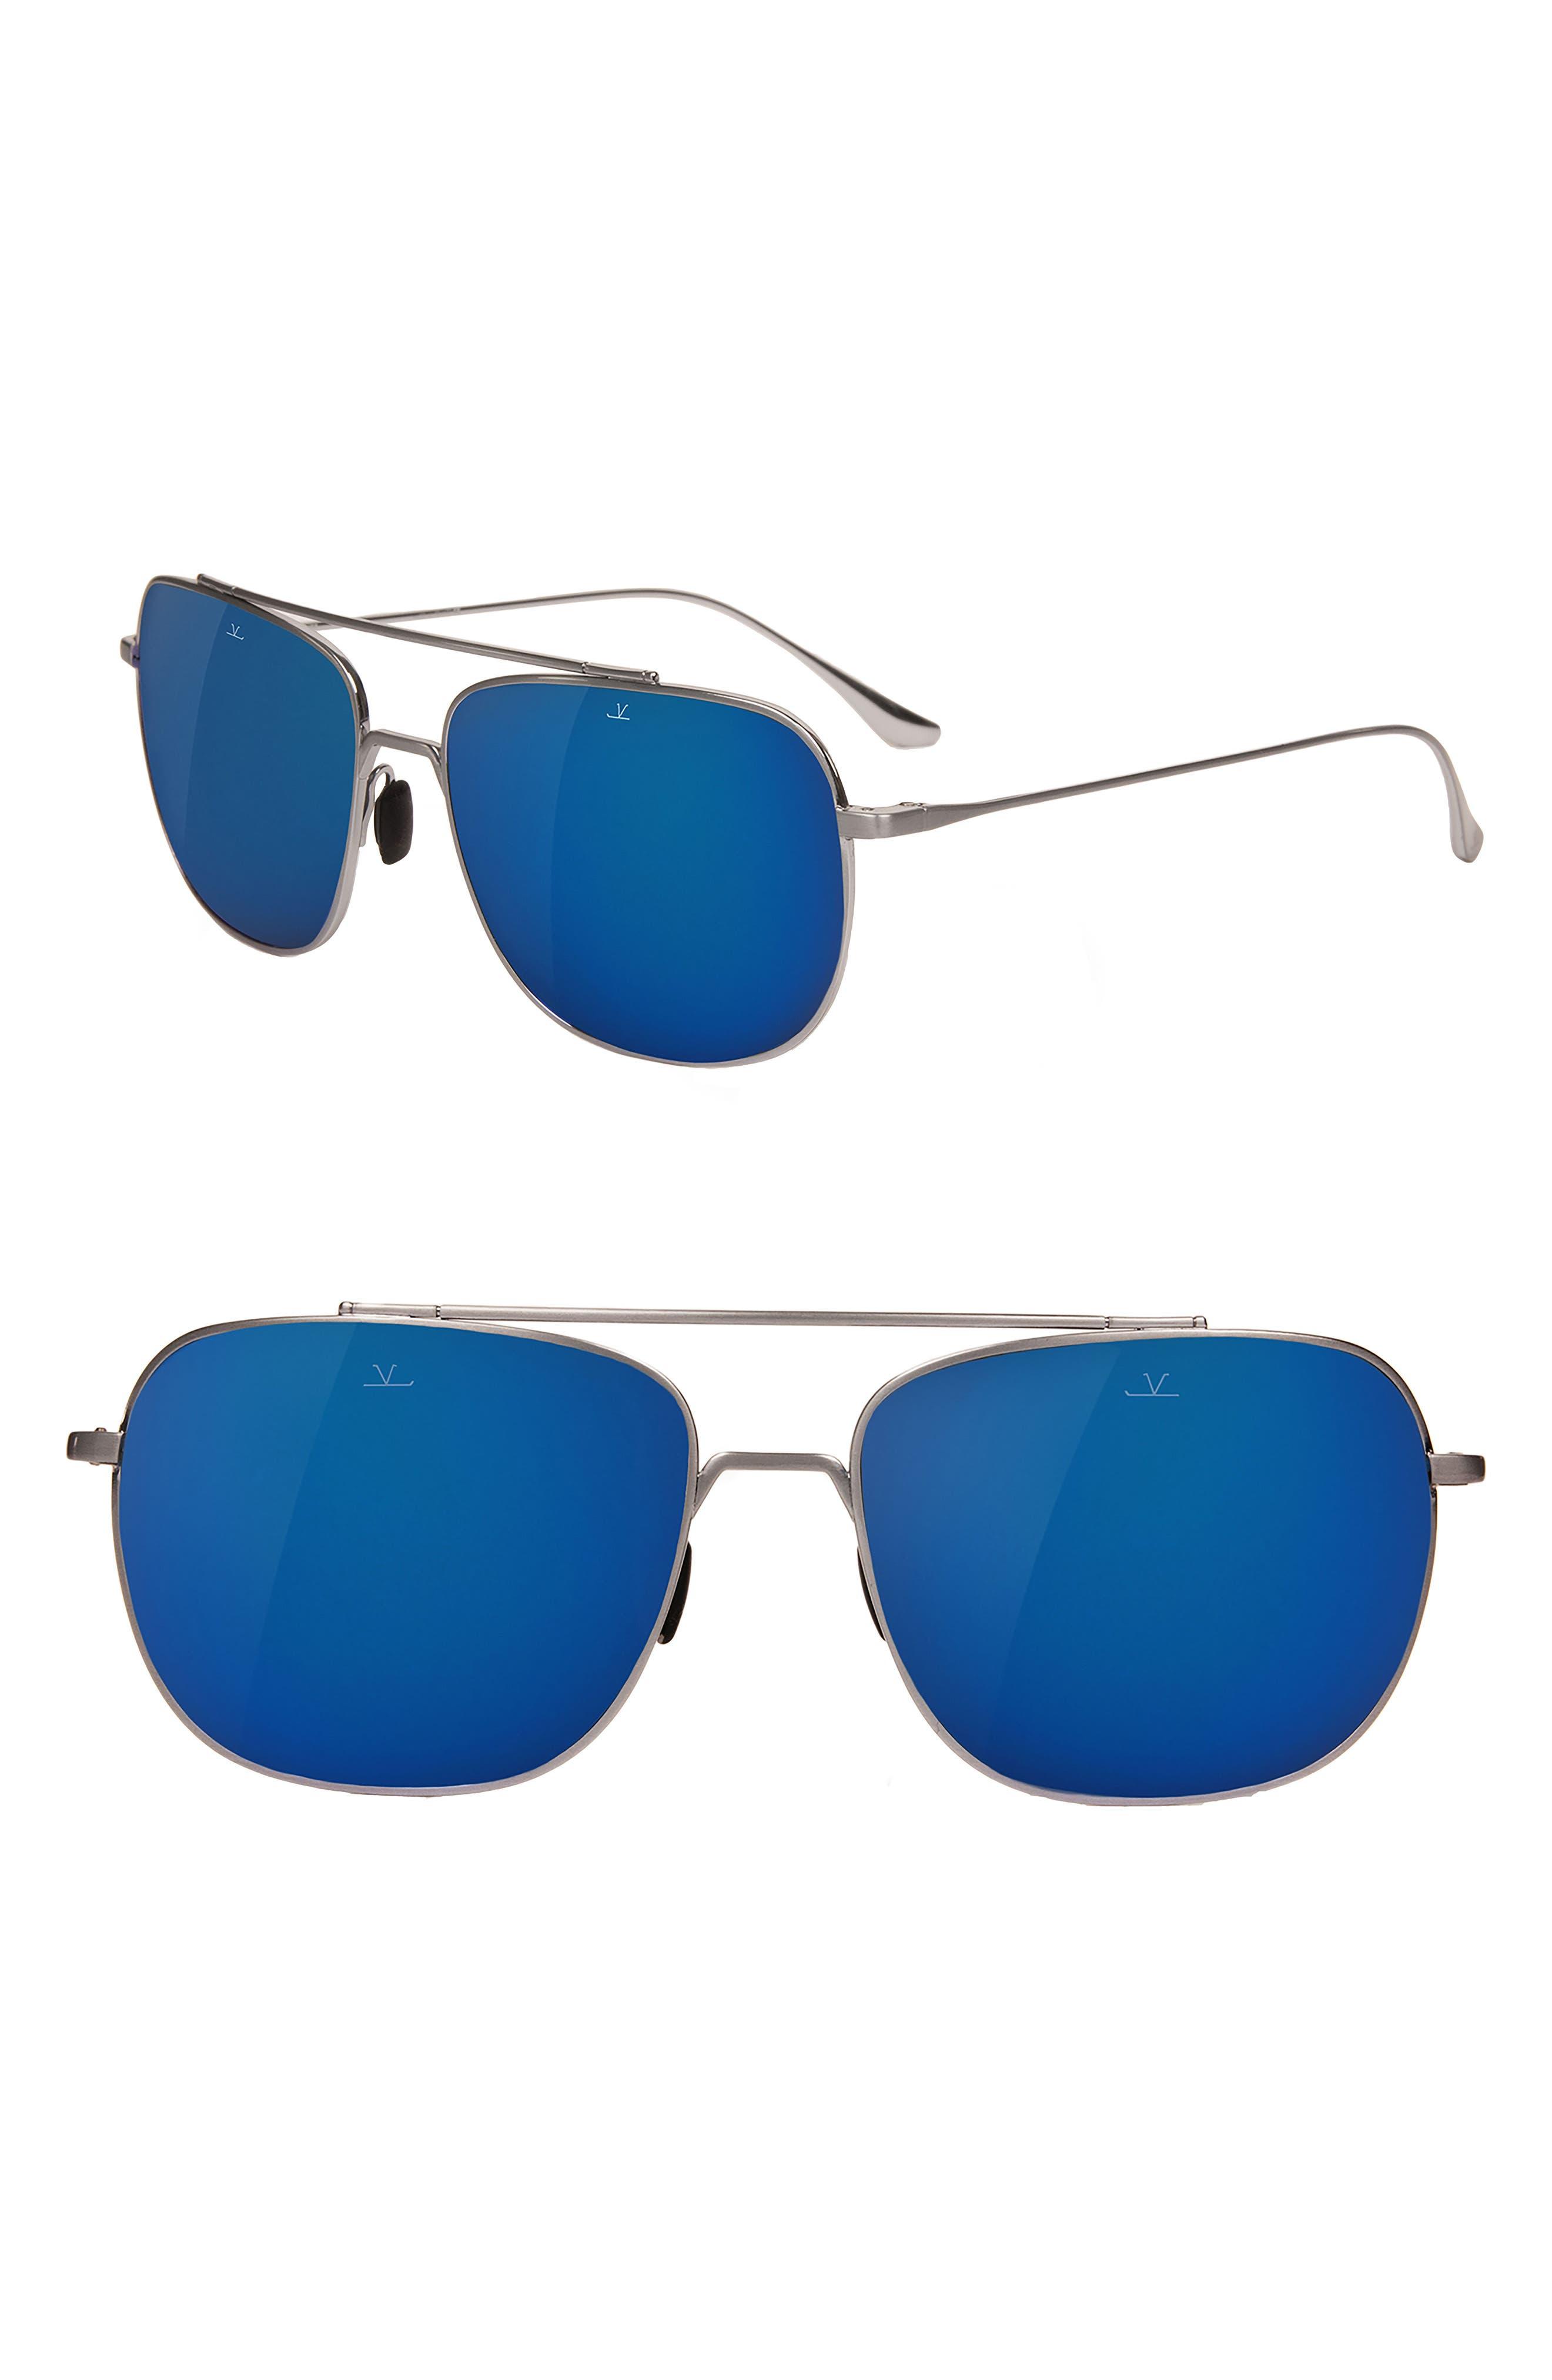 Swing 58mm Navigator Sunglasses,                             Main thumbnail 1, color,                             PURE GREY BLUE FLASH